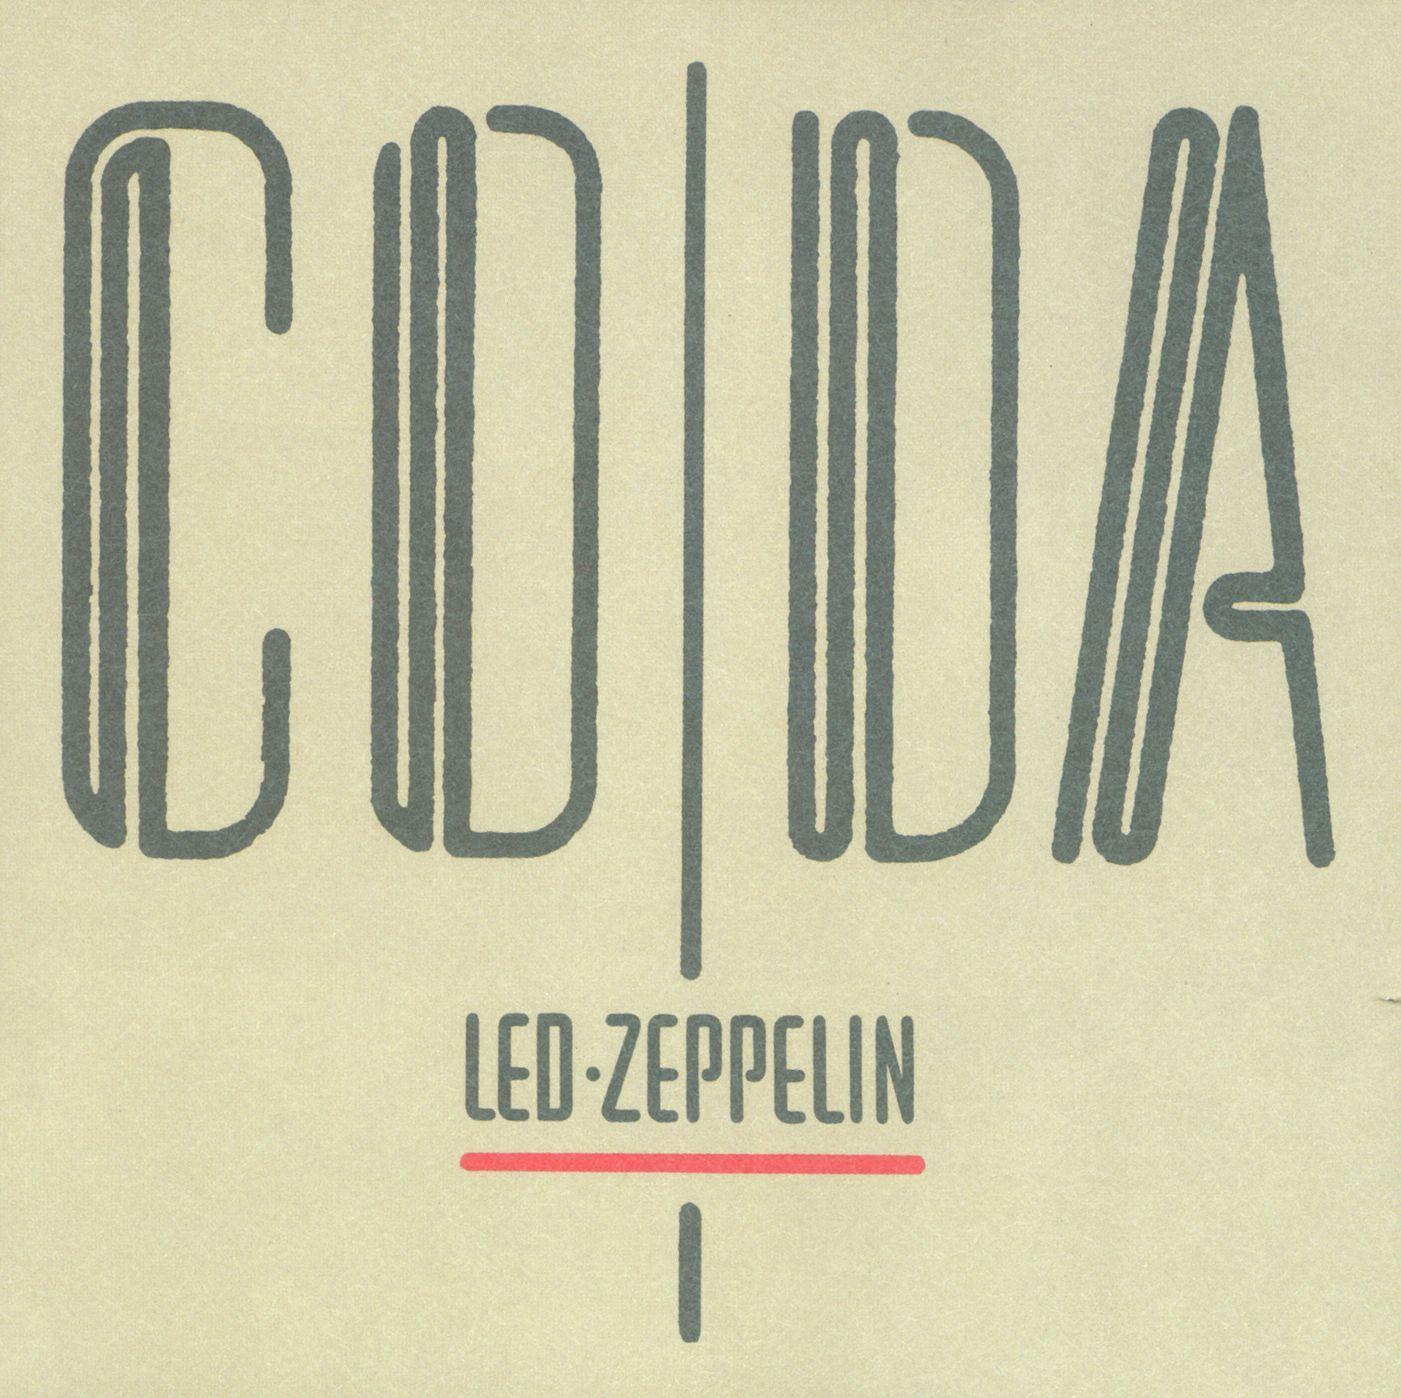 Coda (Deluxe) by Led Zeppelin image